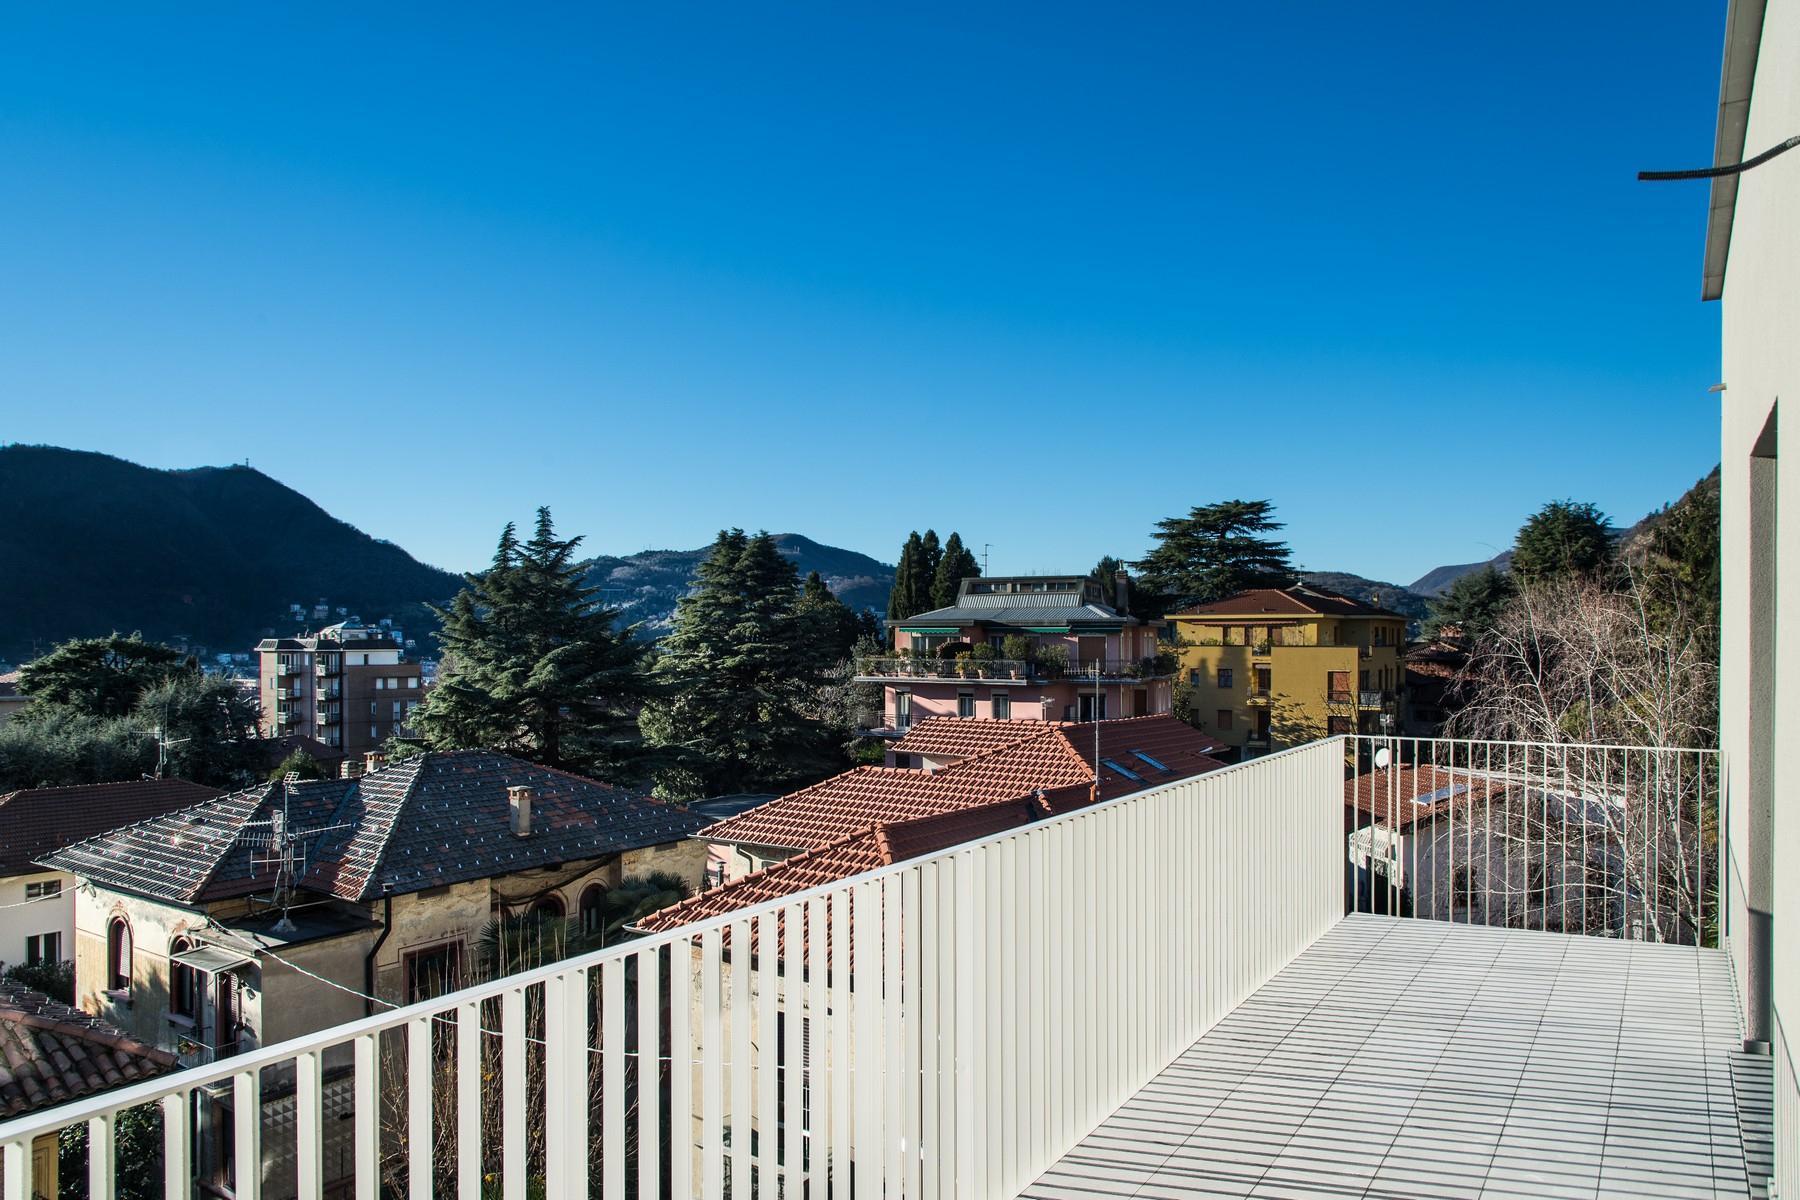 Exclusif appartement neuf en position panoramique - 11